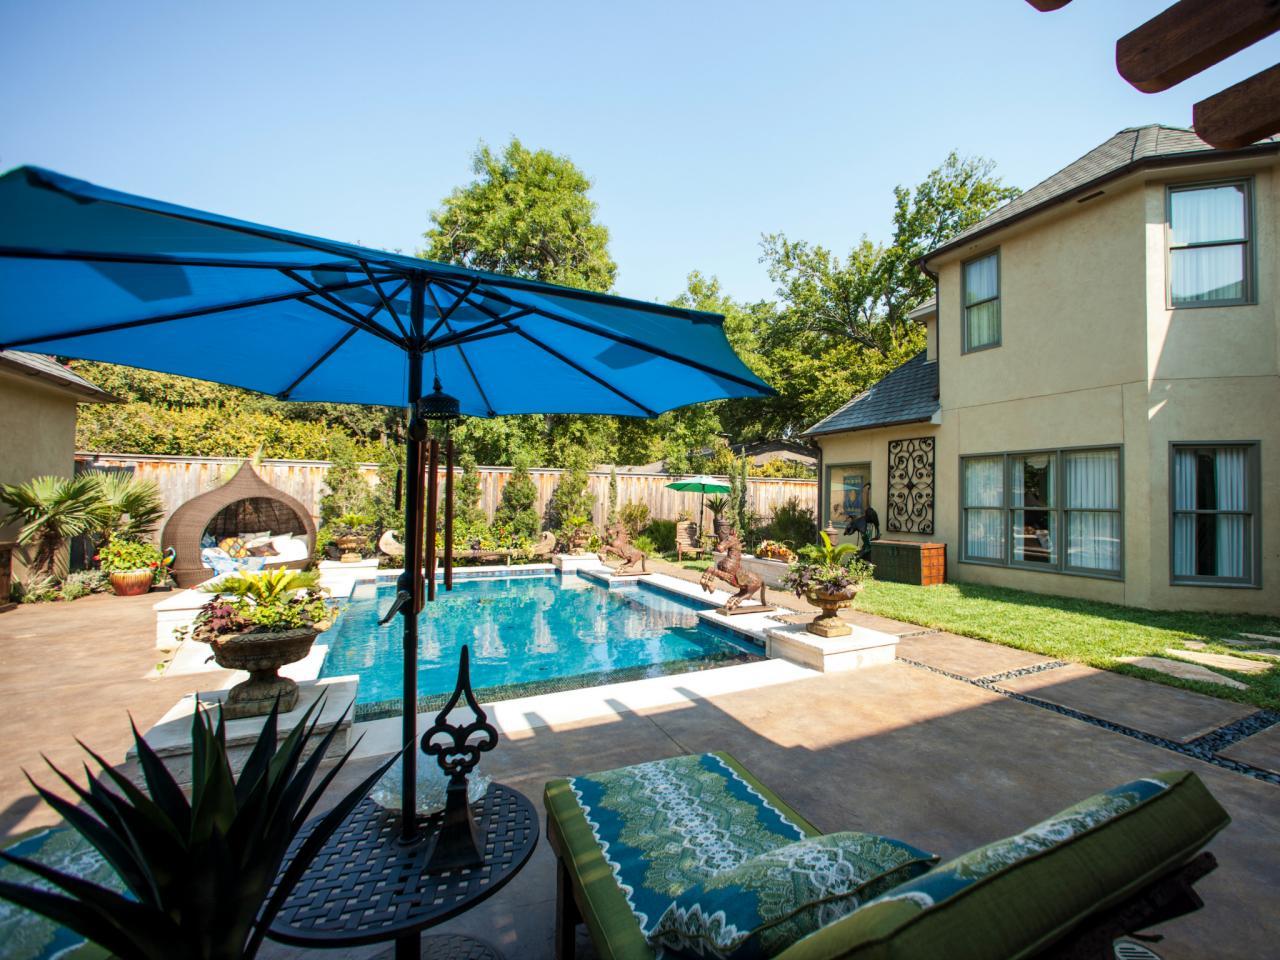 Pool Deck Designs and Options | DIY on Diy Back Deck Ideas id=80568